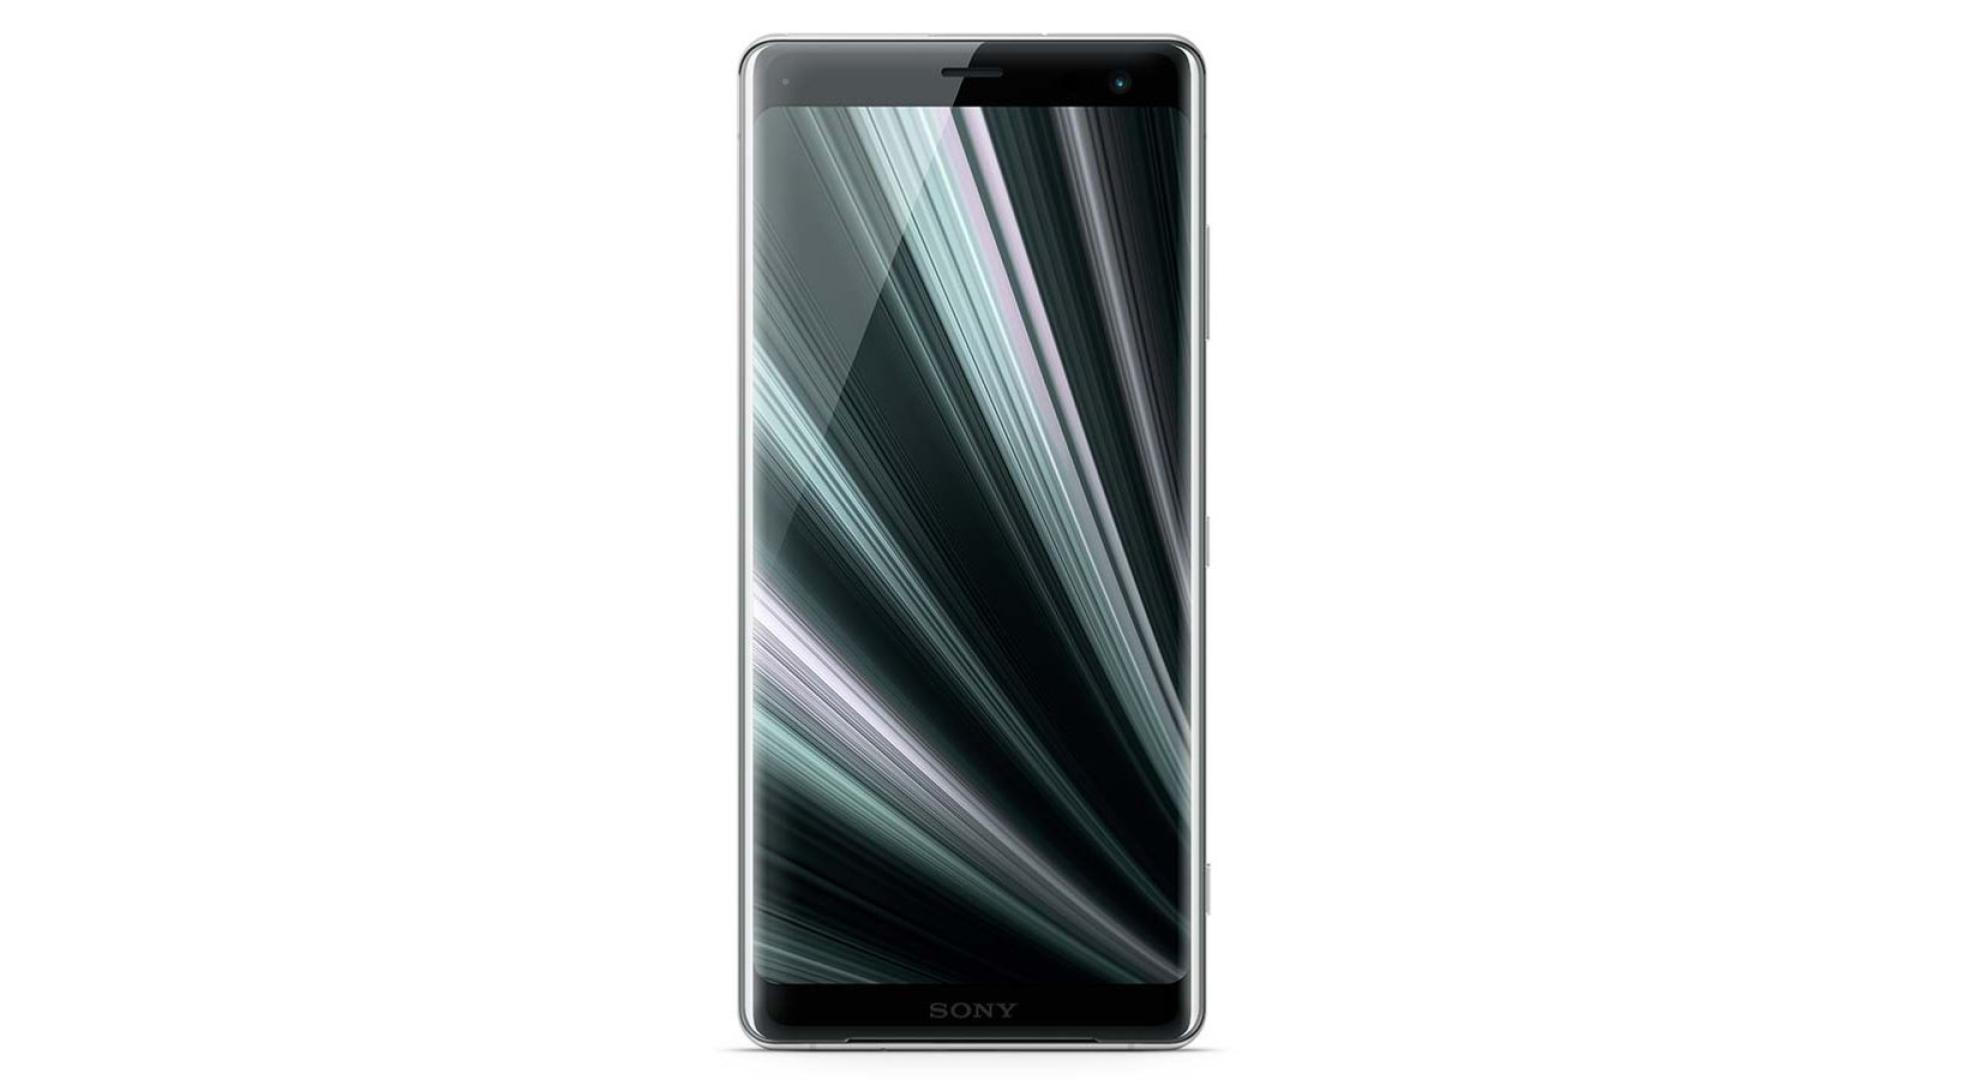 🔥 Bon plan : le Sony Xperia XZ3 passe à 599 euros au lieu de 799 euros